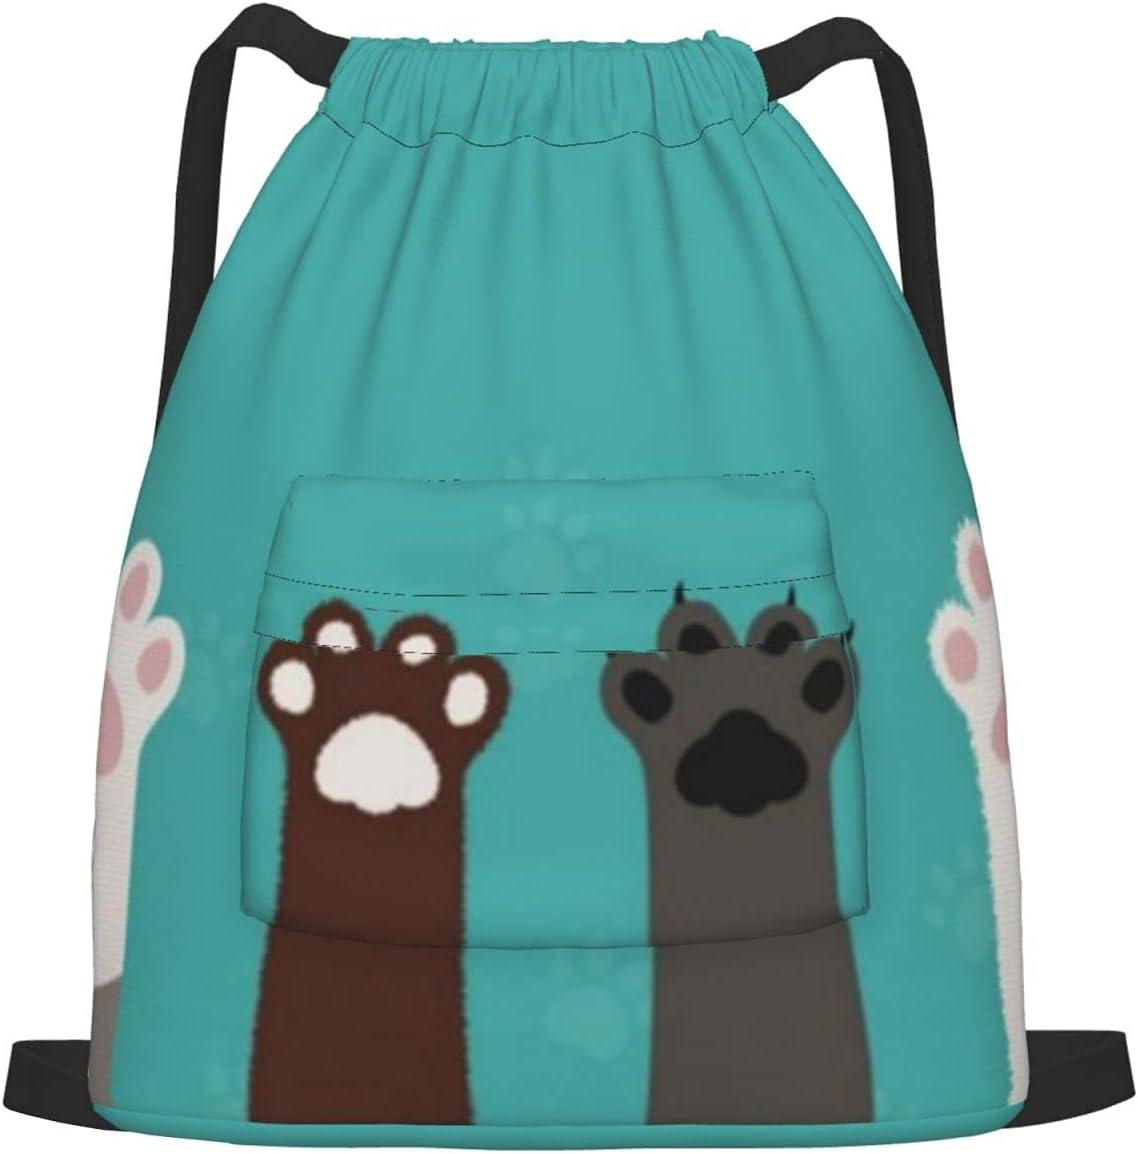 Cat Arlington Mall Paws Drawstring Sports Backpack Outstanding Drawstr Yoga Gym Bag